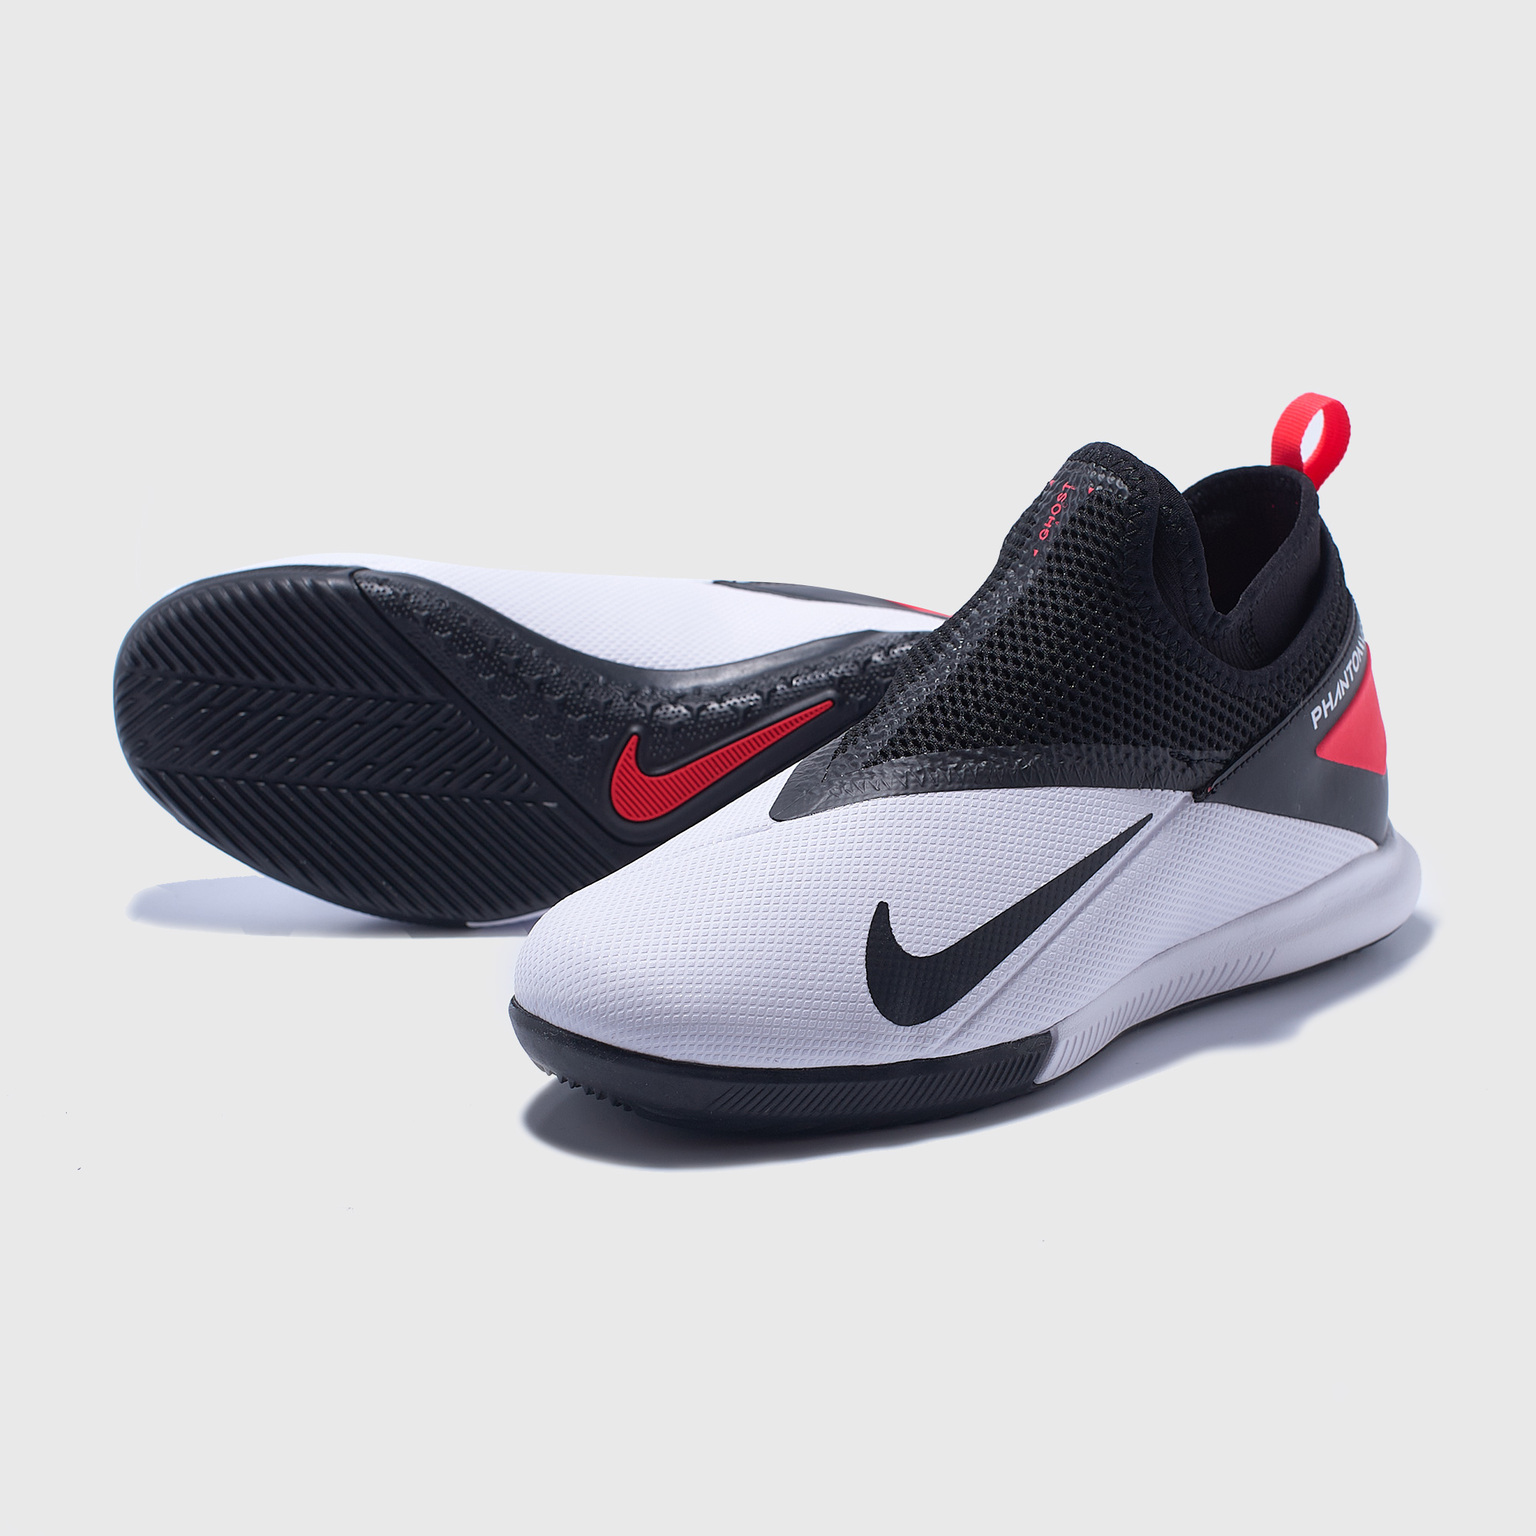 Футзалки детские Nike Phantom Vision 2 Academy DF IC CD4071-106 футзалки nike superflyx 6 academy ic ah7369 701